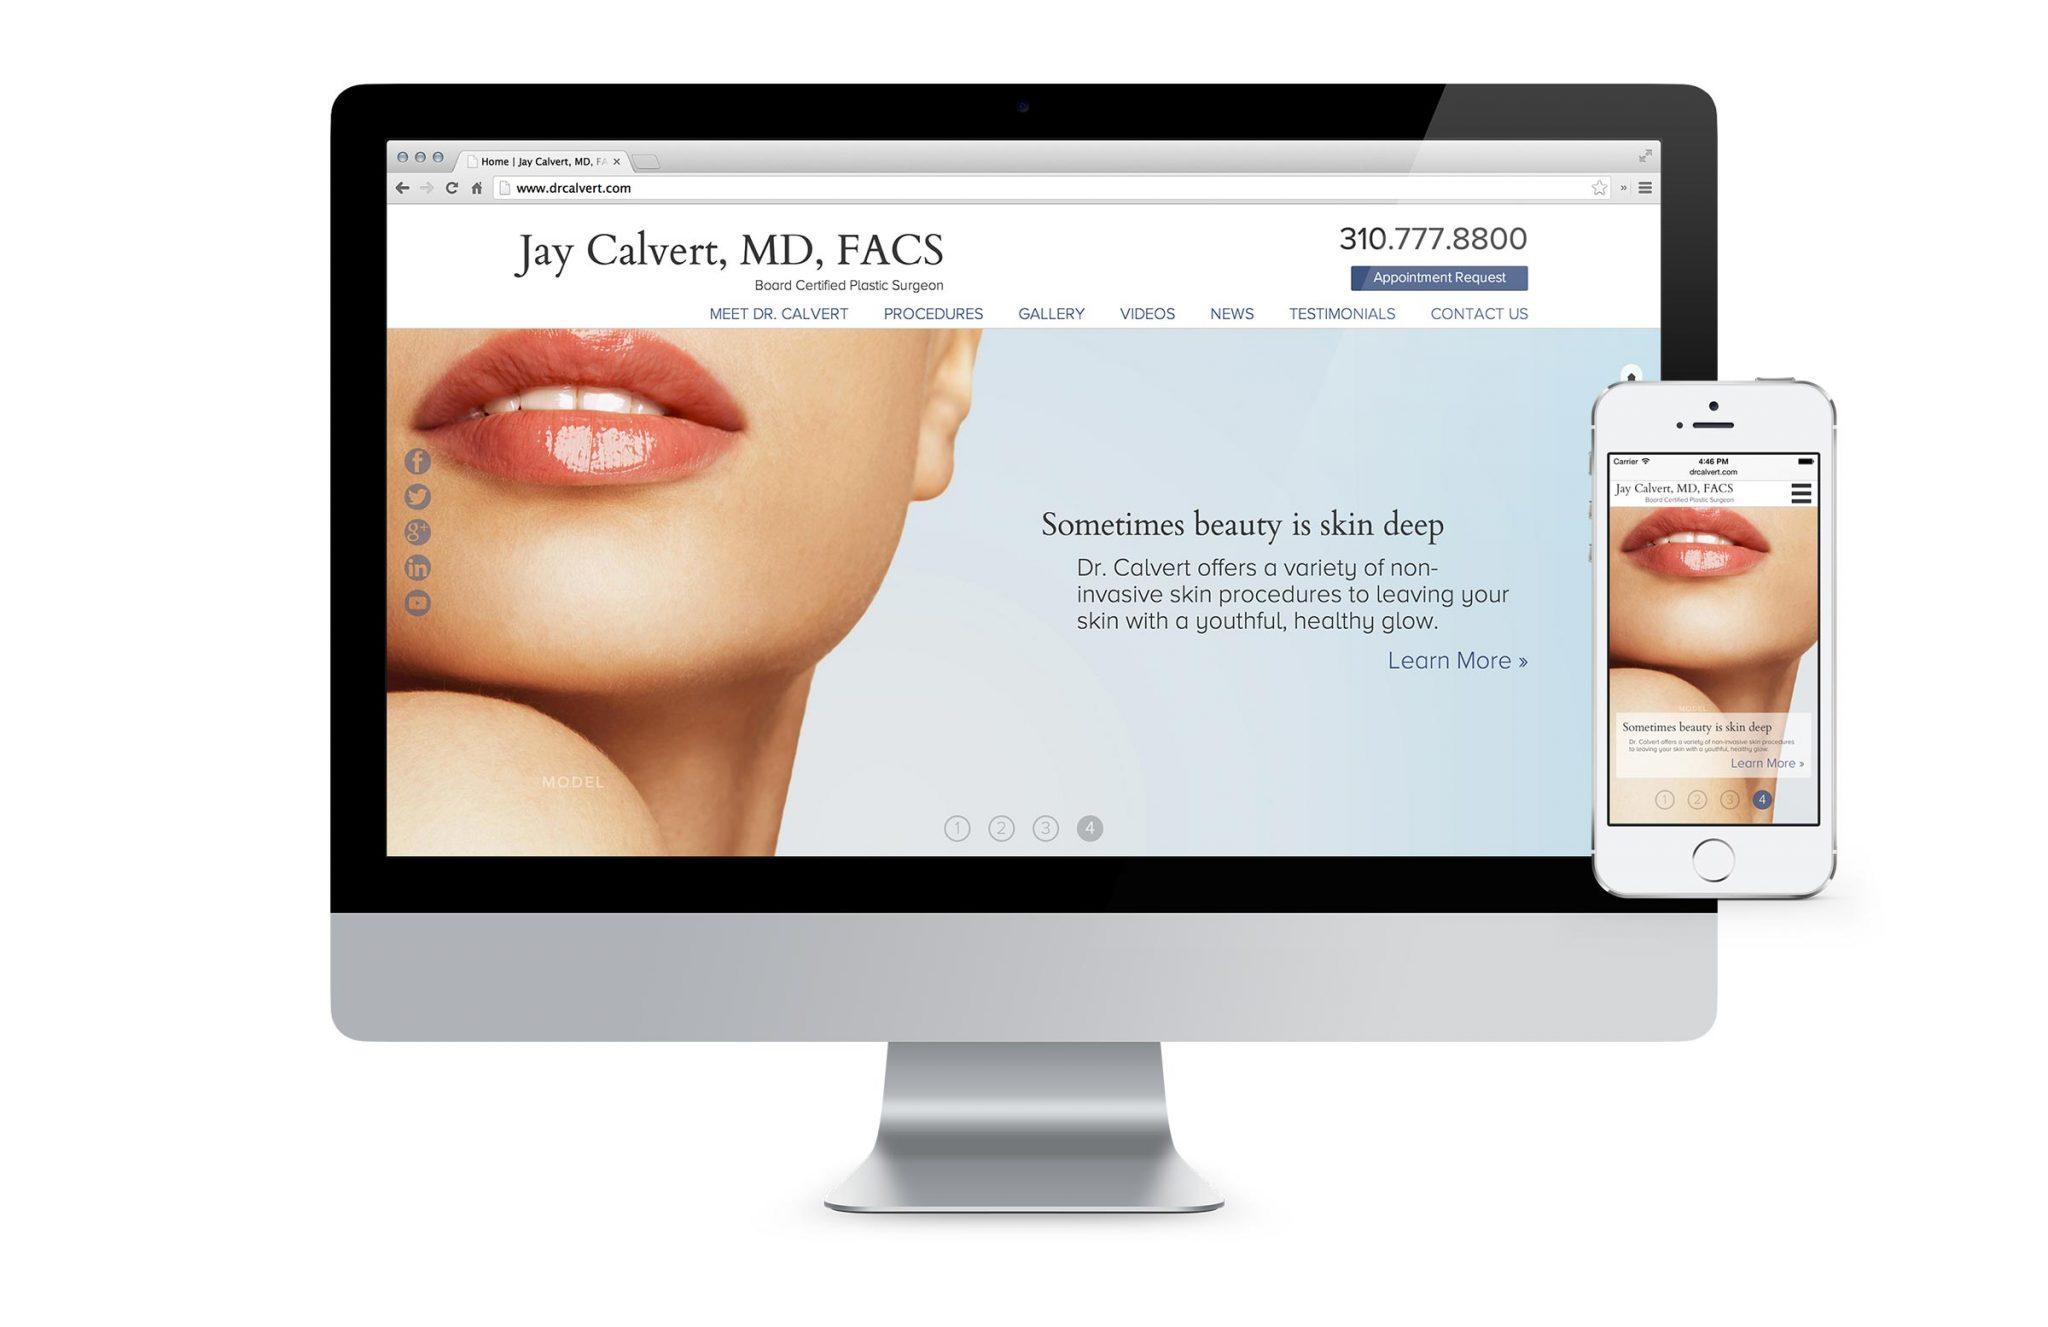 plastic surgeon marketing